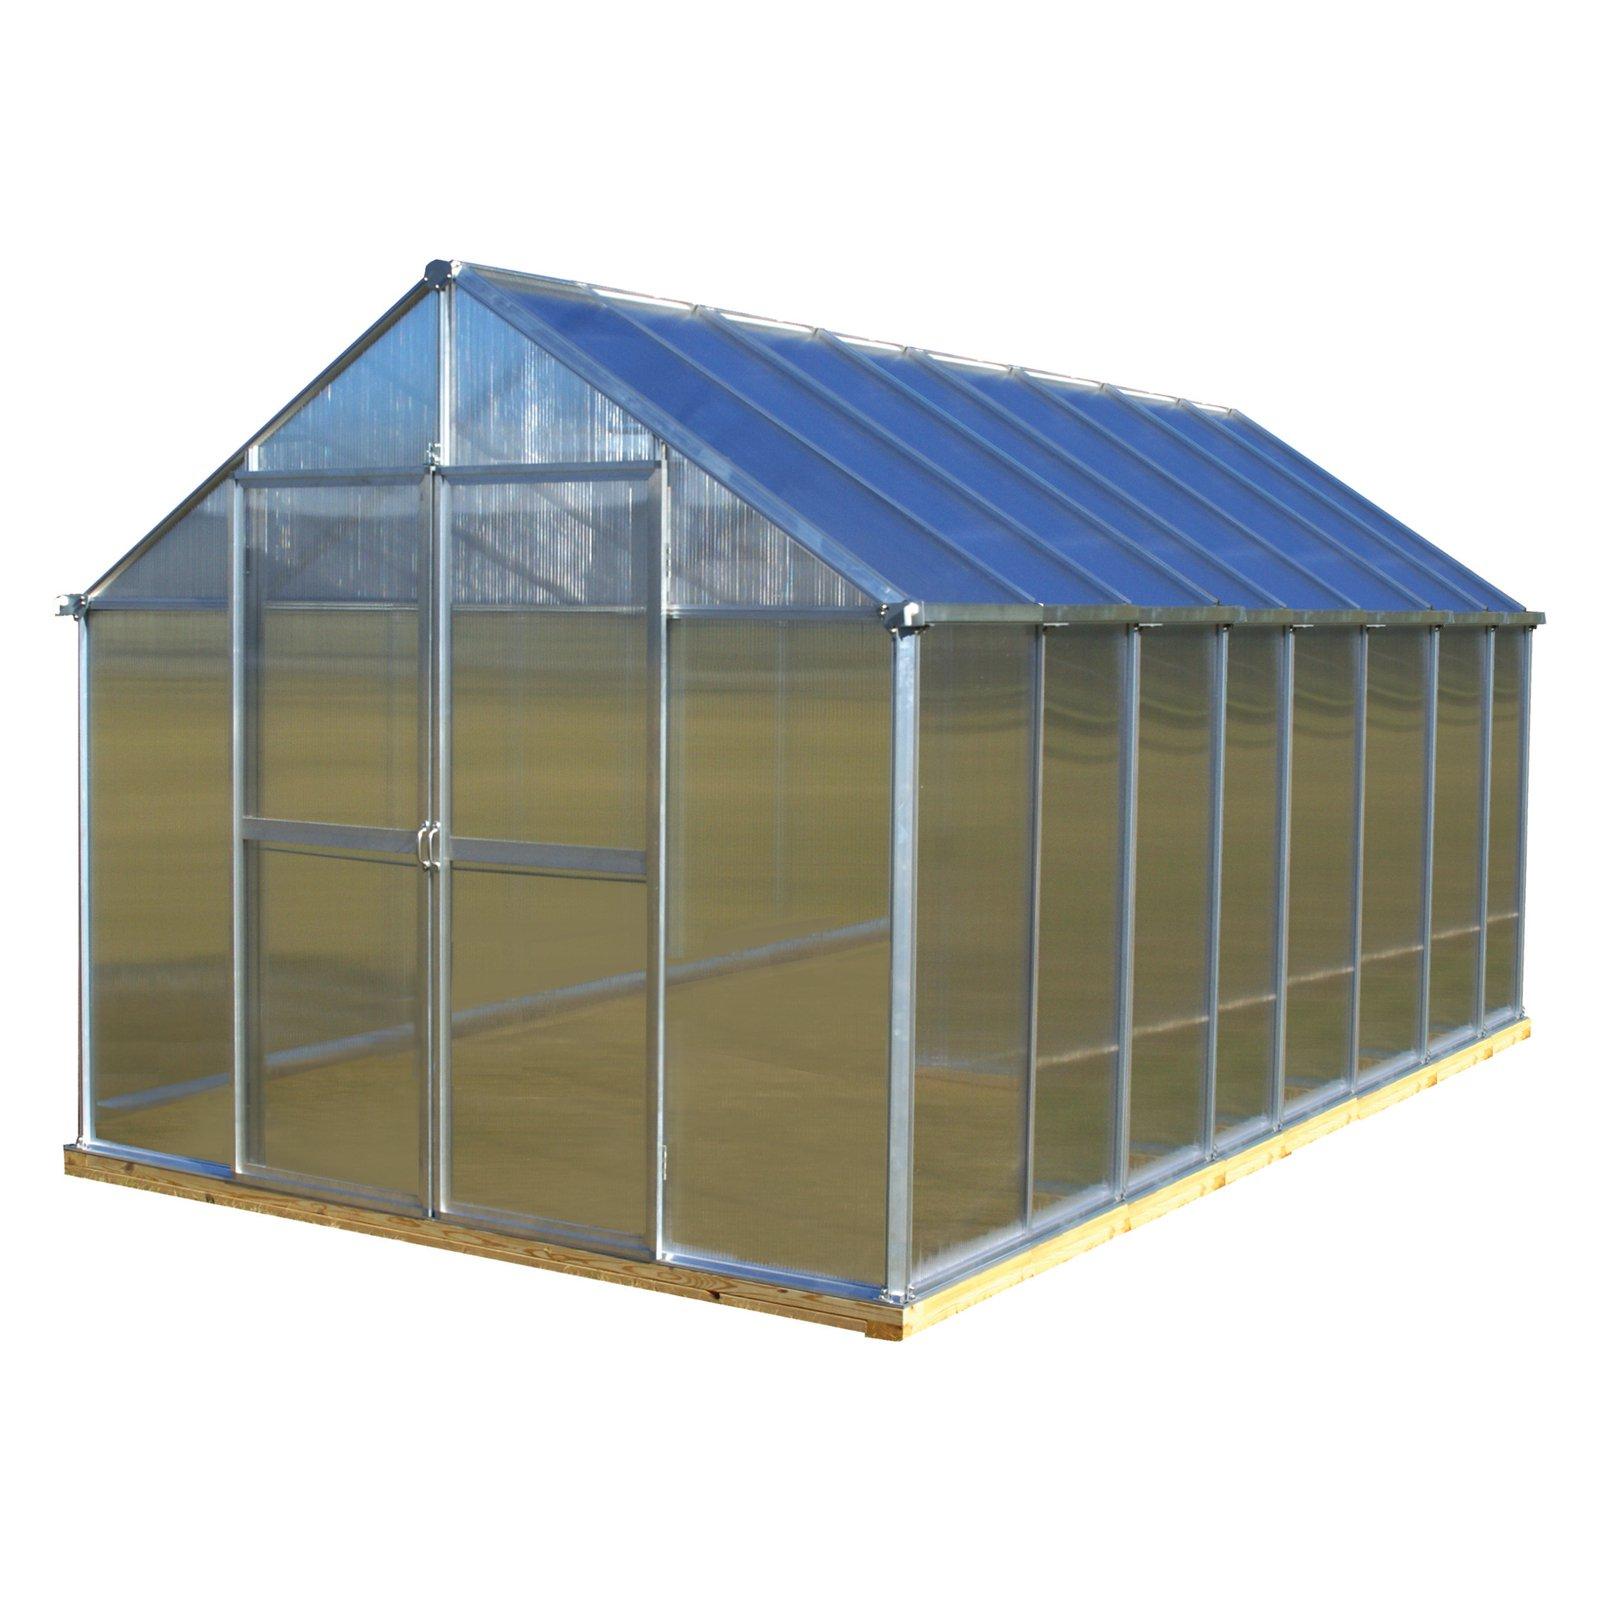 Monticello Monticello 8 x 16 ft. Premium Greenhouse Kit